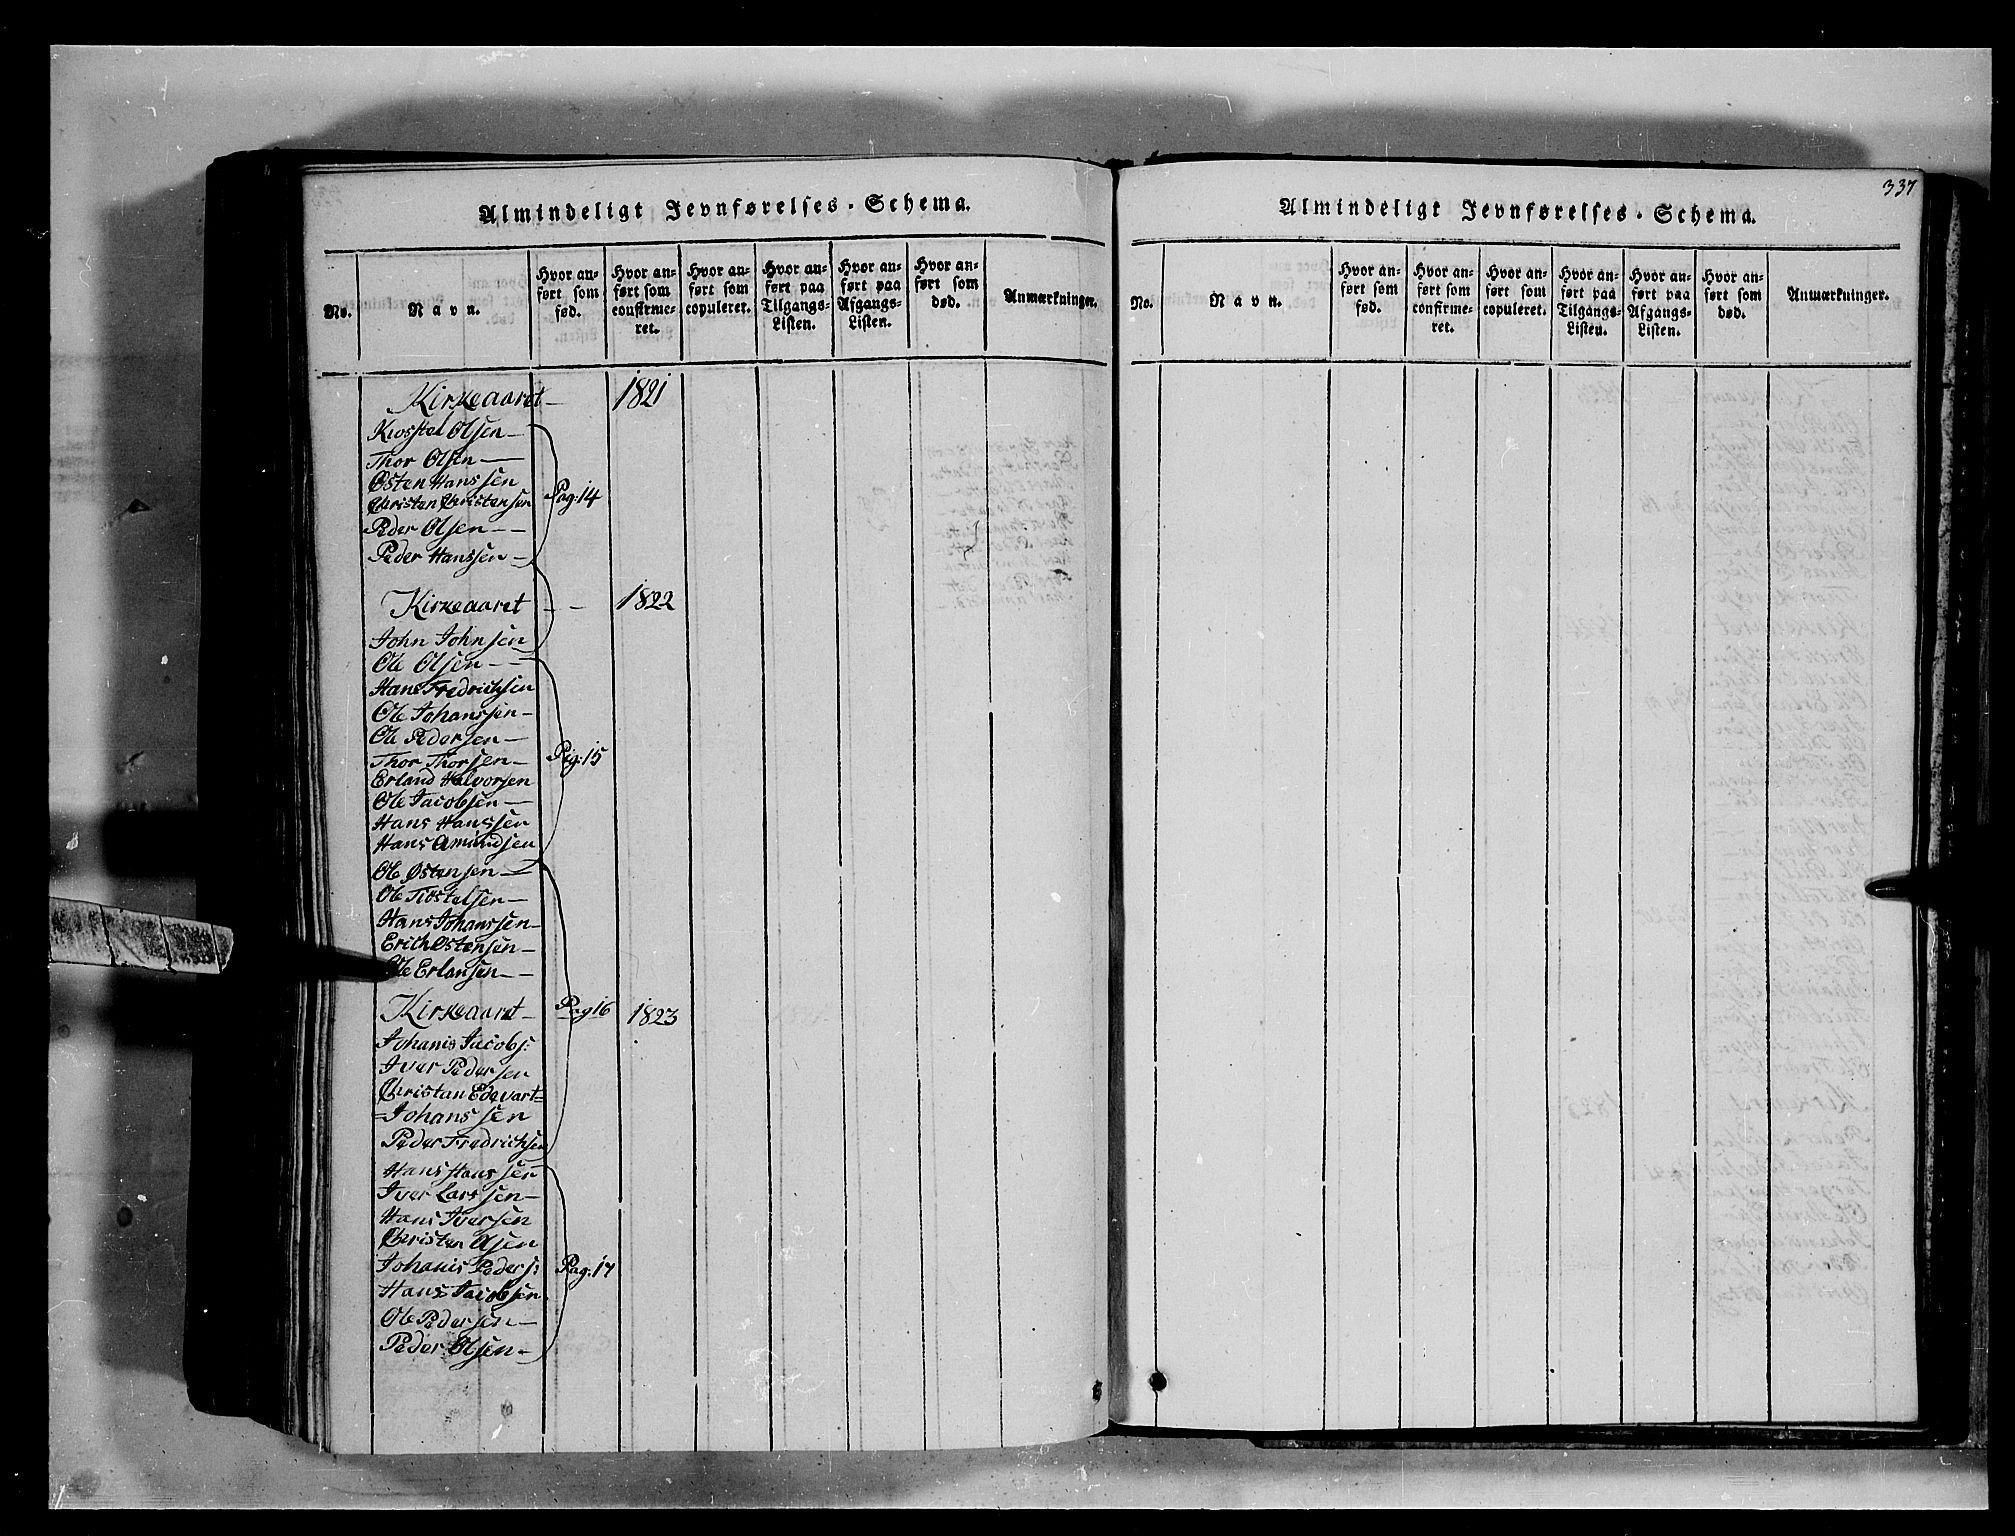 SAH, Fron prestekontor, H/Ha/Hab/L0002: Klokkerbok nr. 2, 1816-1850, s. 337